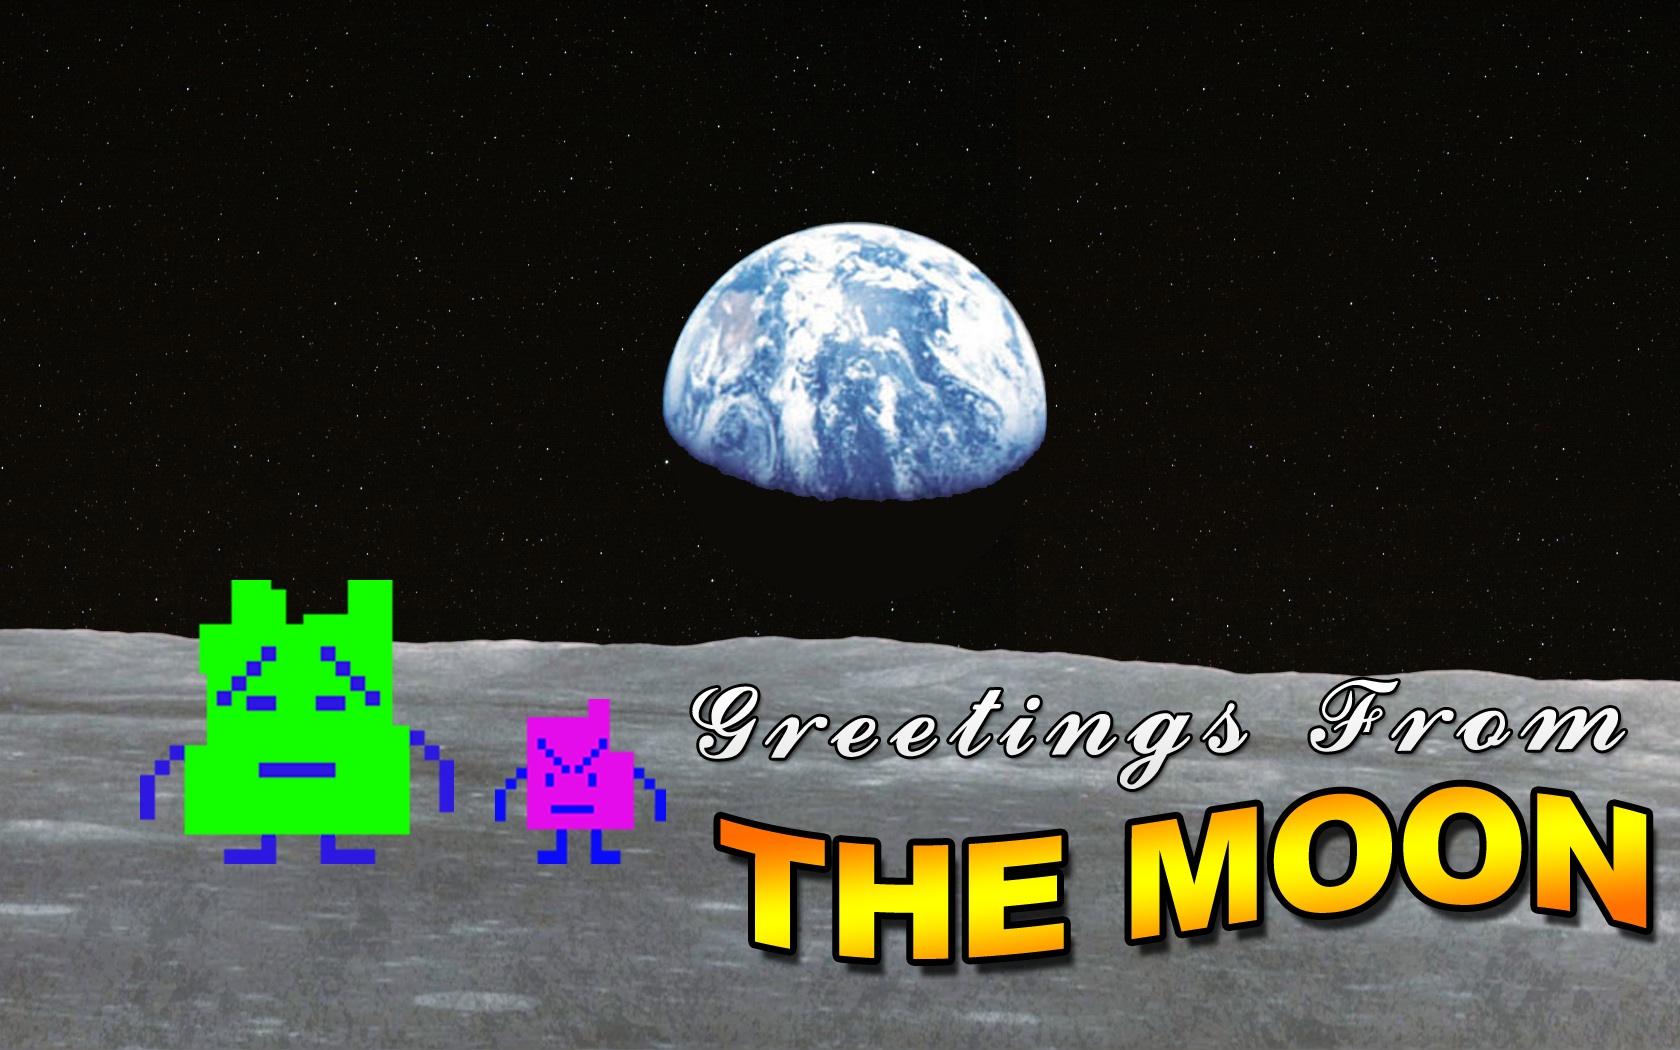 GreetingsFromTheMoon.jpg